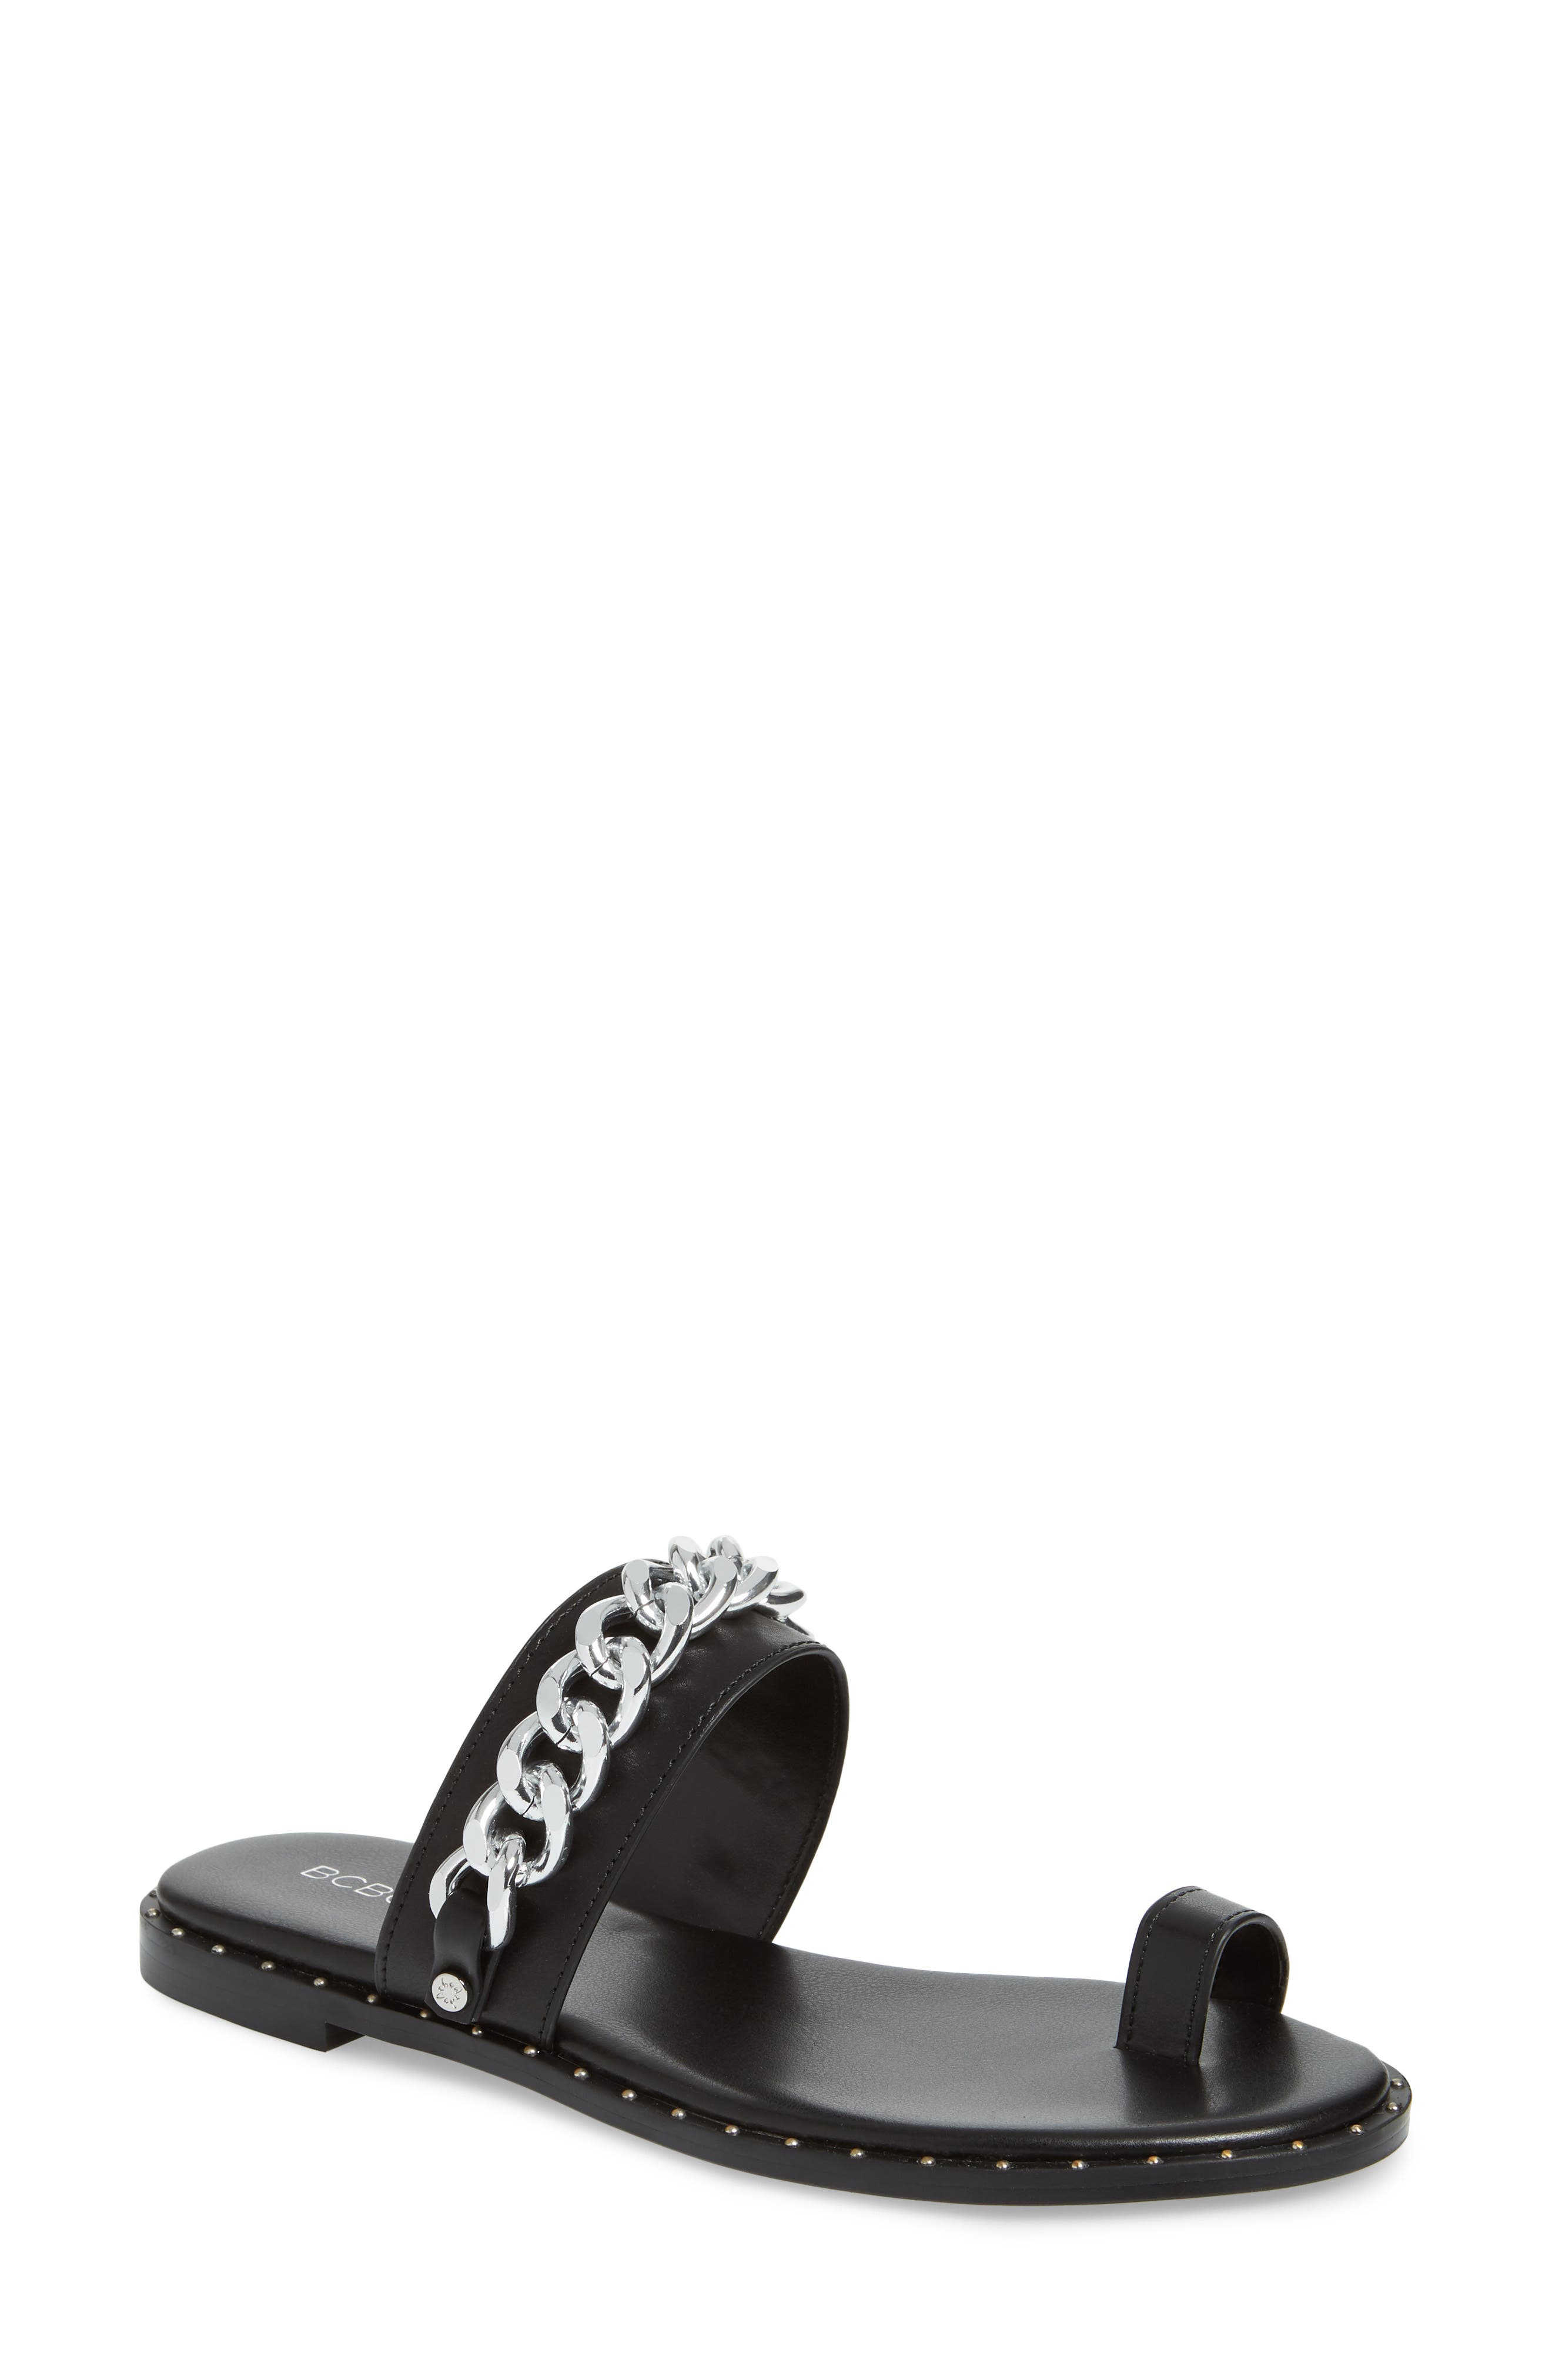 Zola Chain Slide Sandal,                             Main thumbnail 1, color,                             BLACK